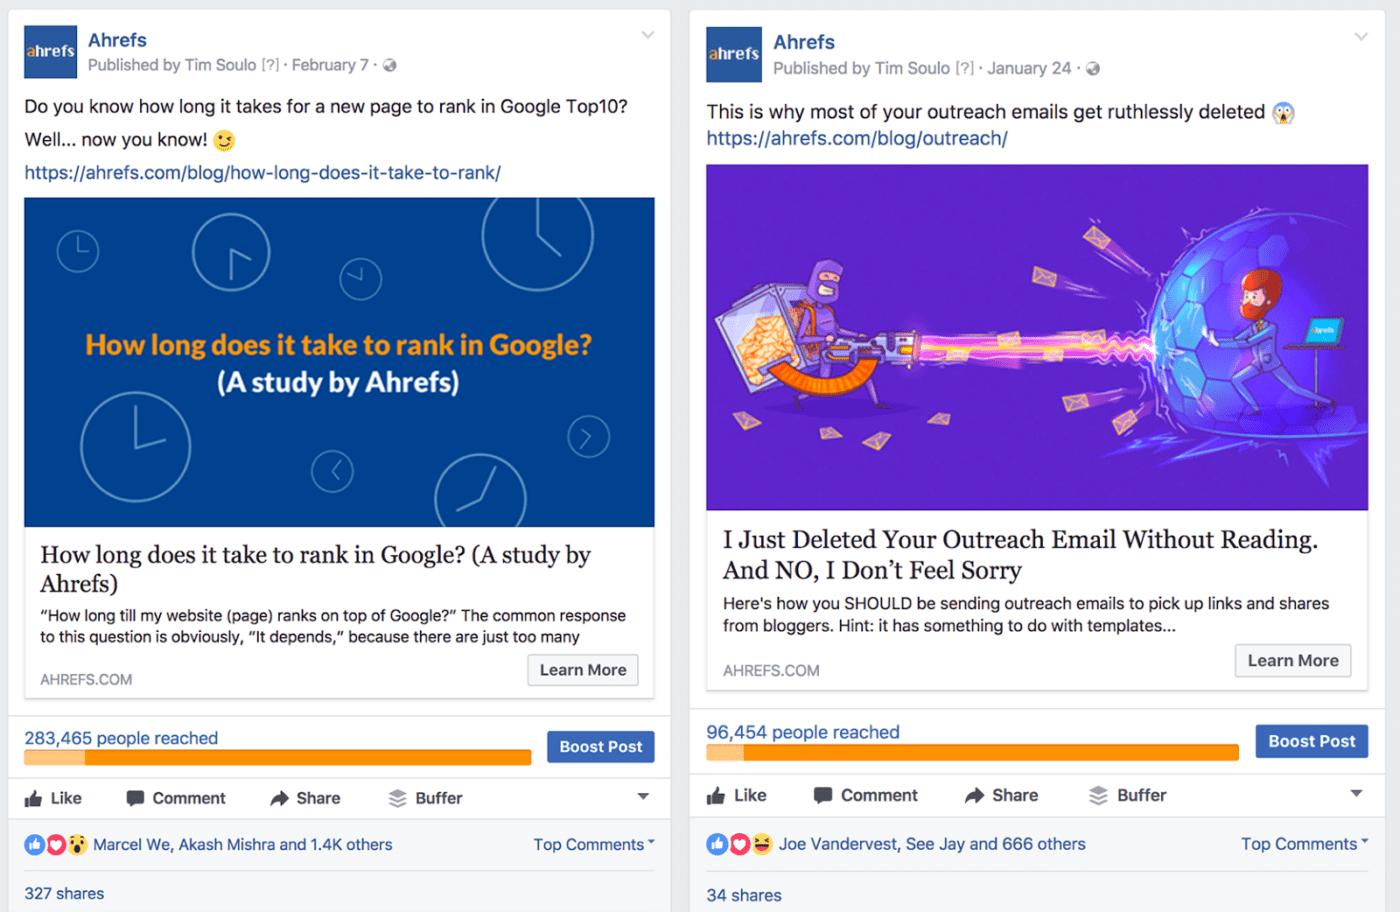 Ahrefs' Facebook ads